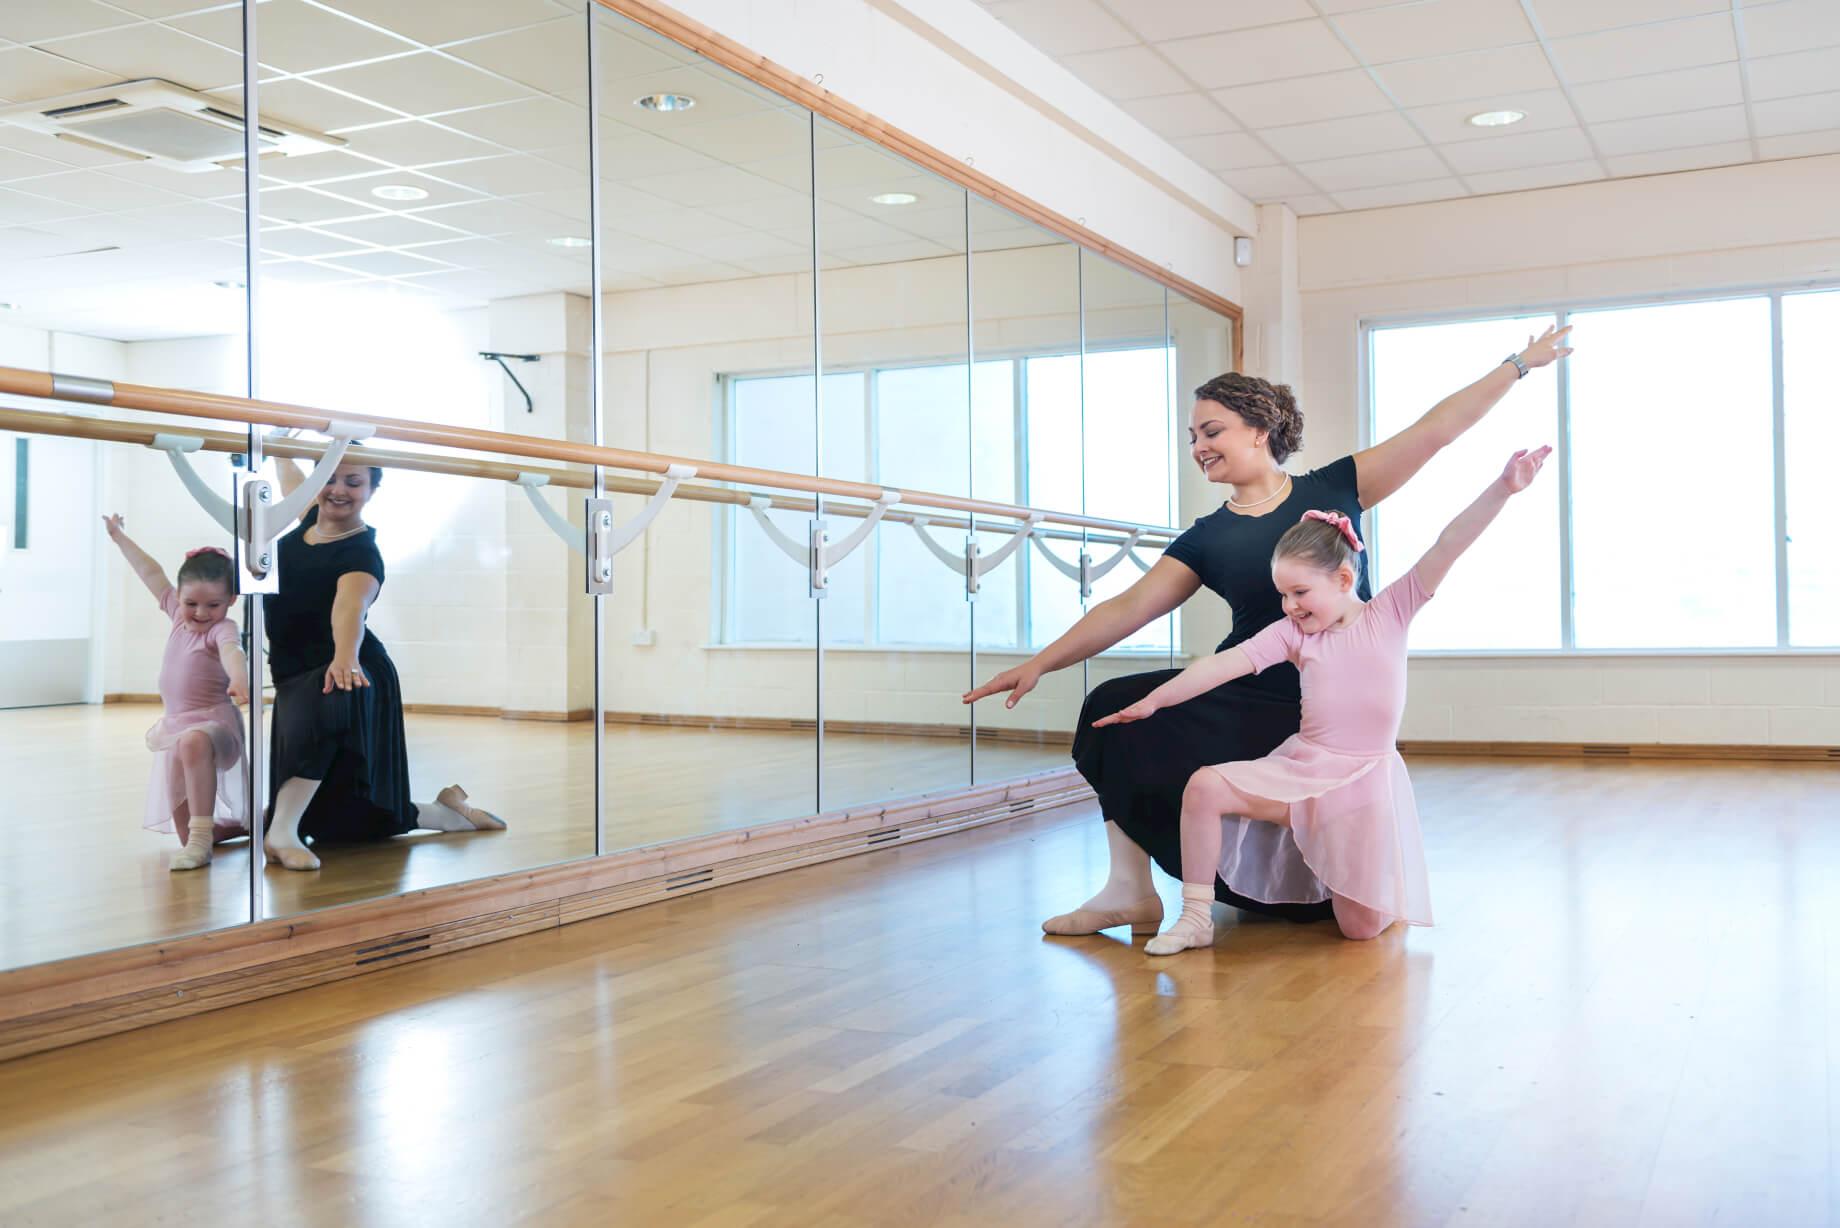 rnsd-ballet-school-tiny-dancer-diaganol-arms-at-barre-teacher-smiling.jpg